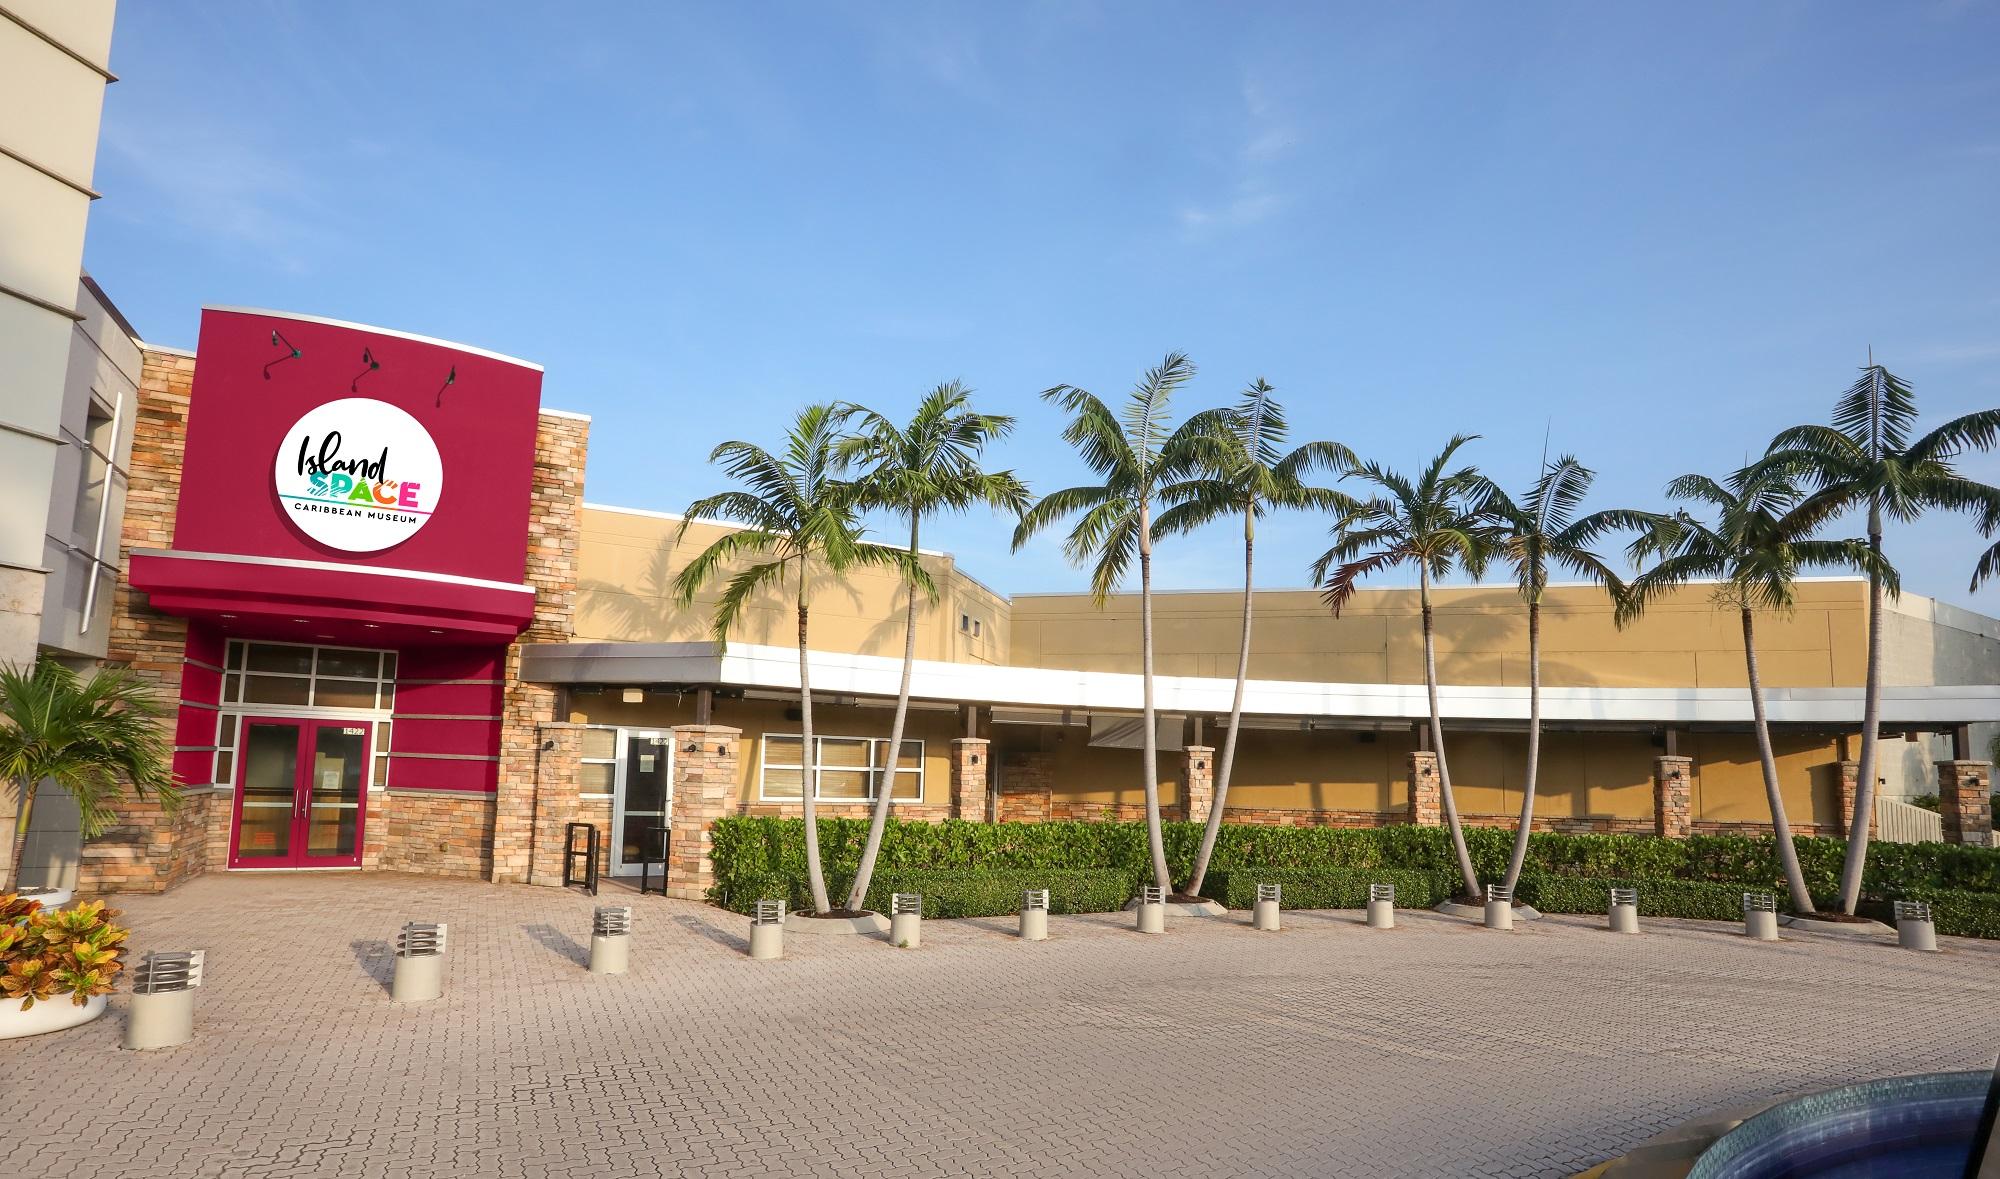 Island SPACE Caribbean Museum